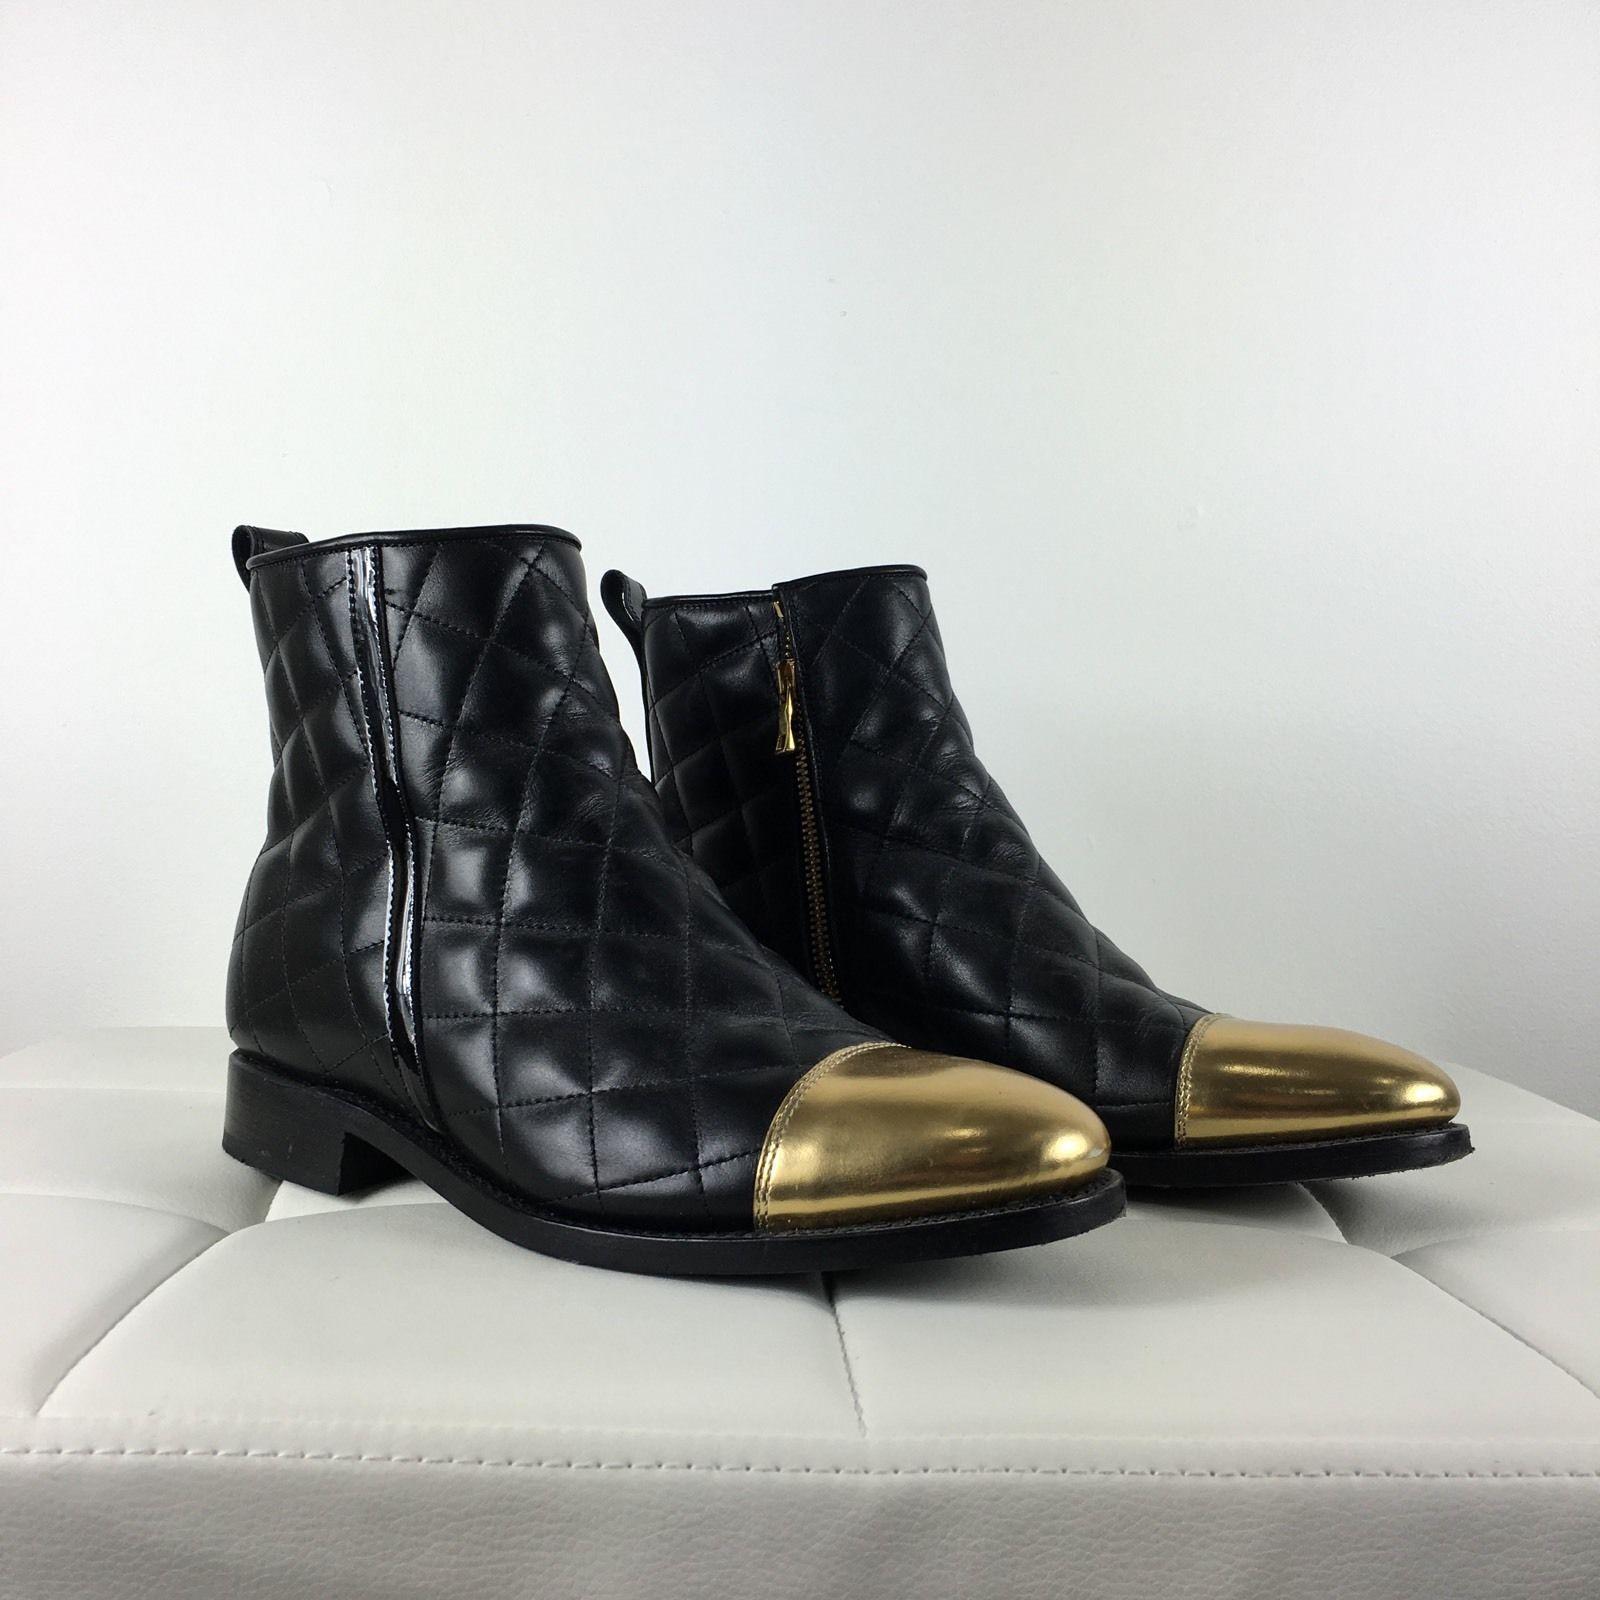 Pre-owned-Balmain mujer- Oro Toe Acolchado Cuero Botas para mujer- Pre-owned-Balmain 046e81